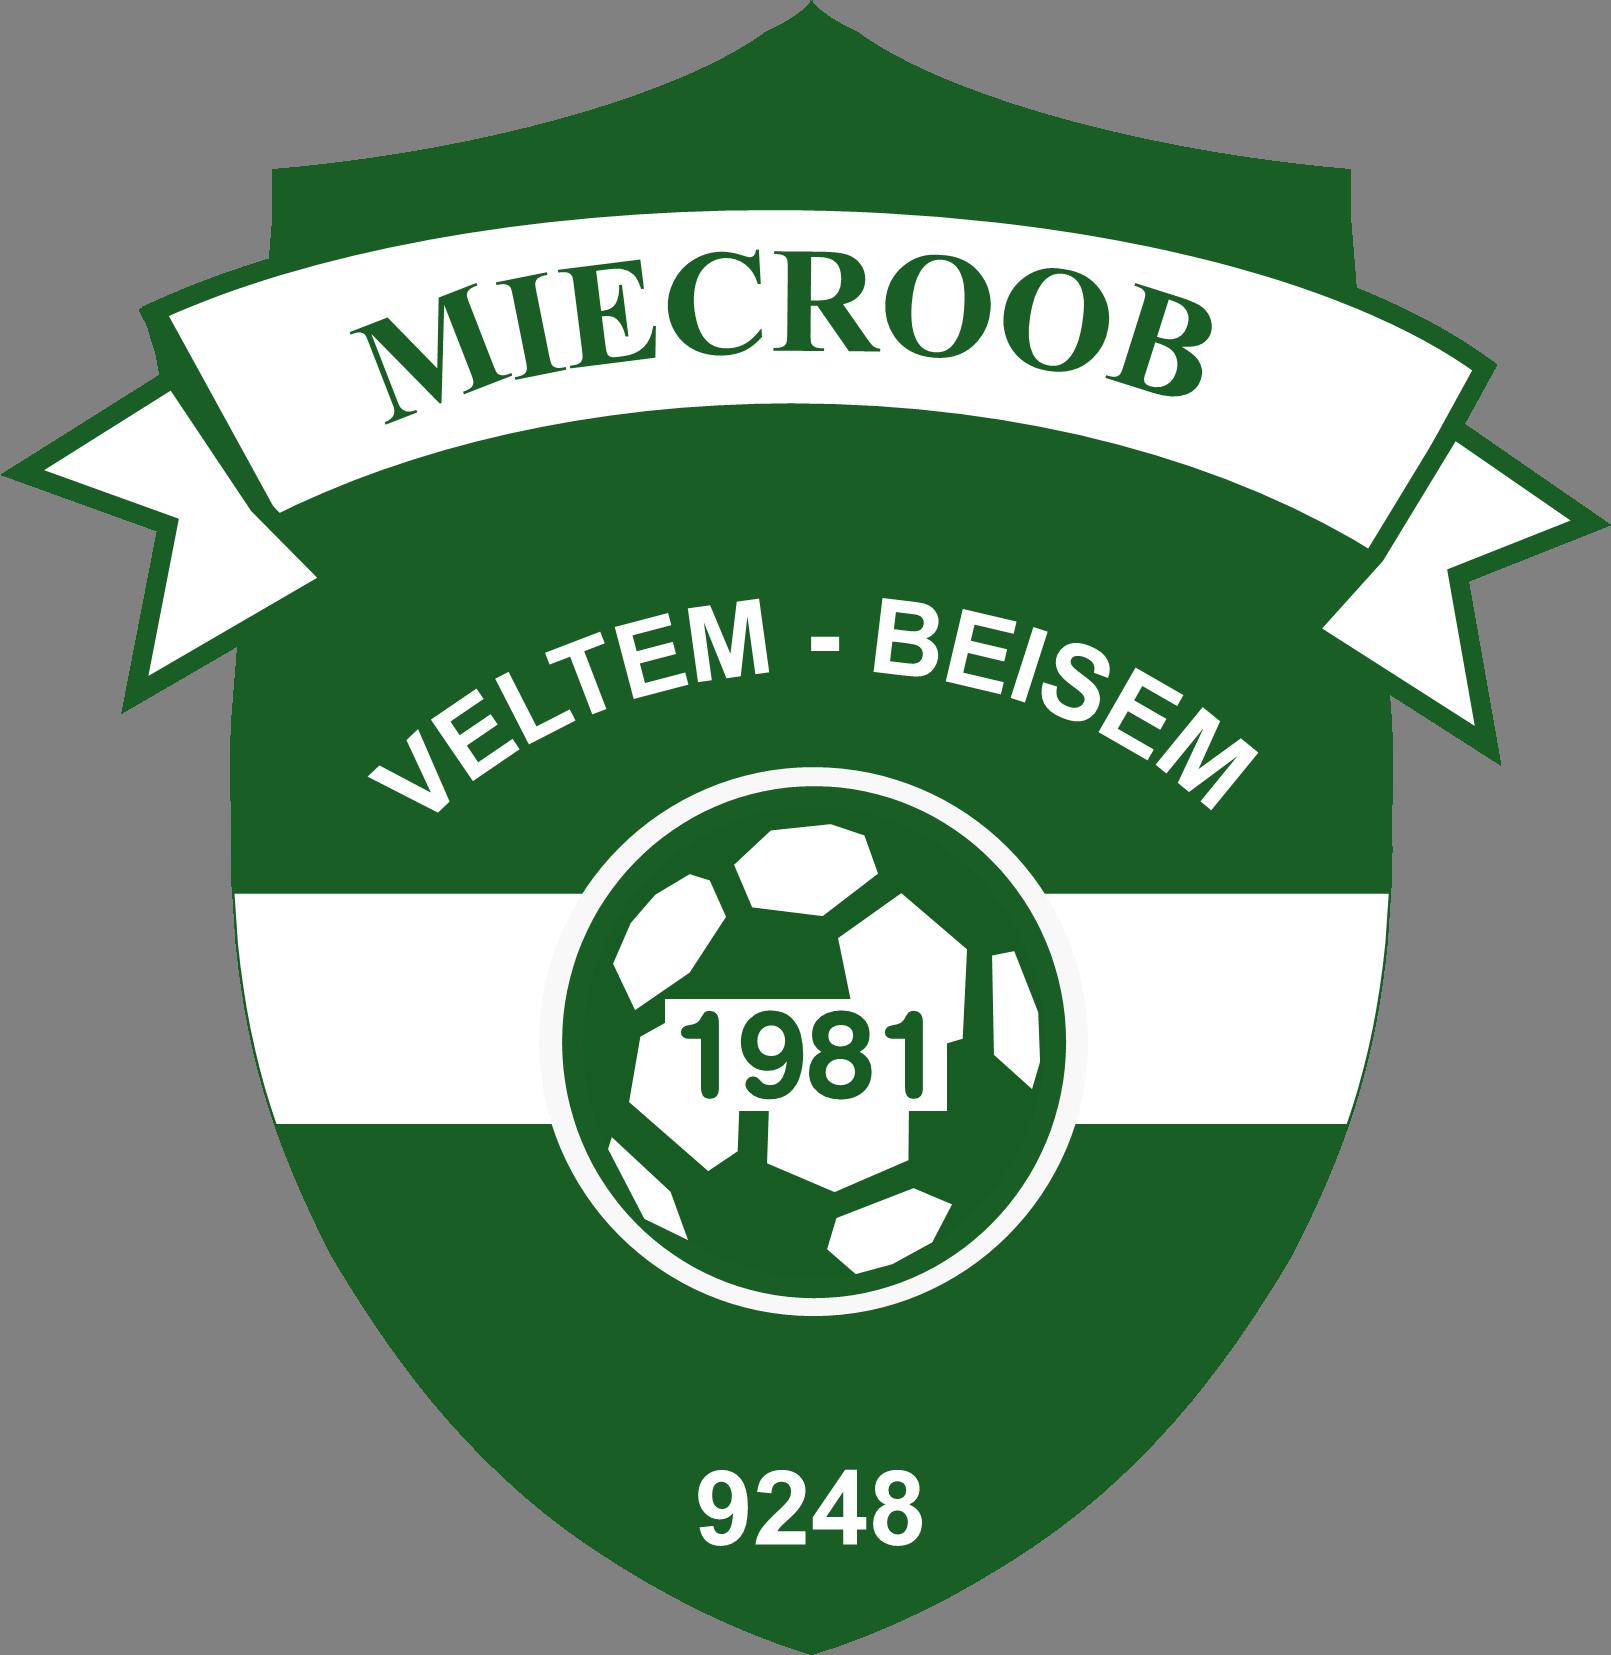 Miecroob